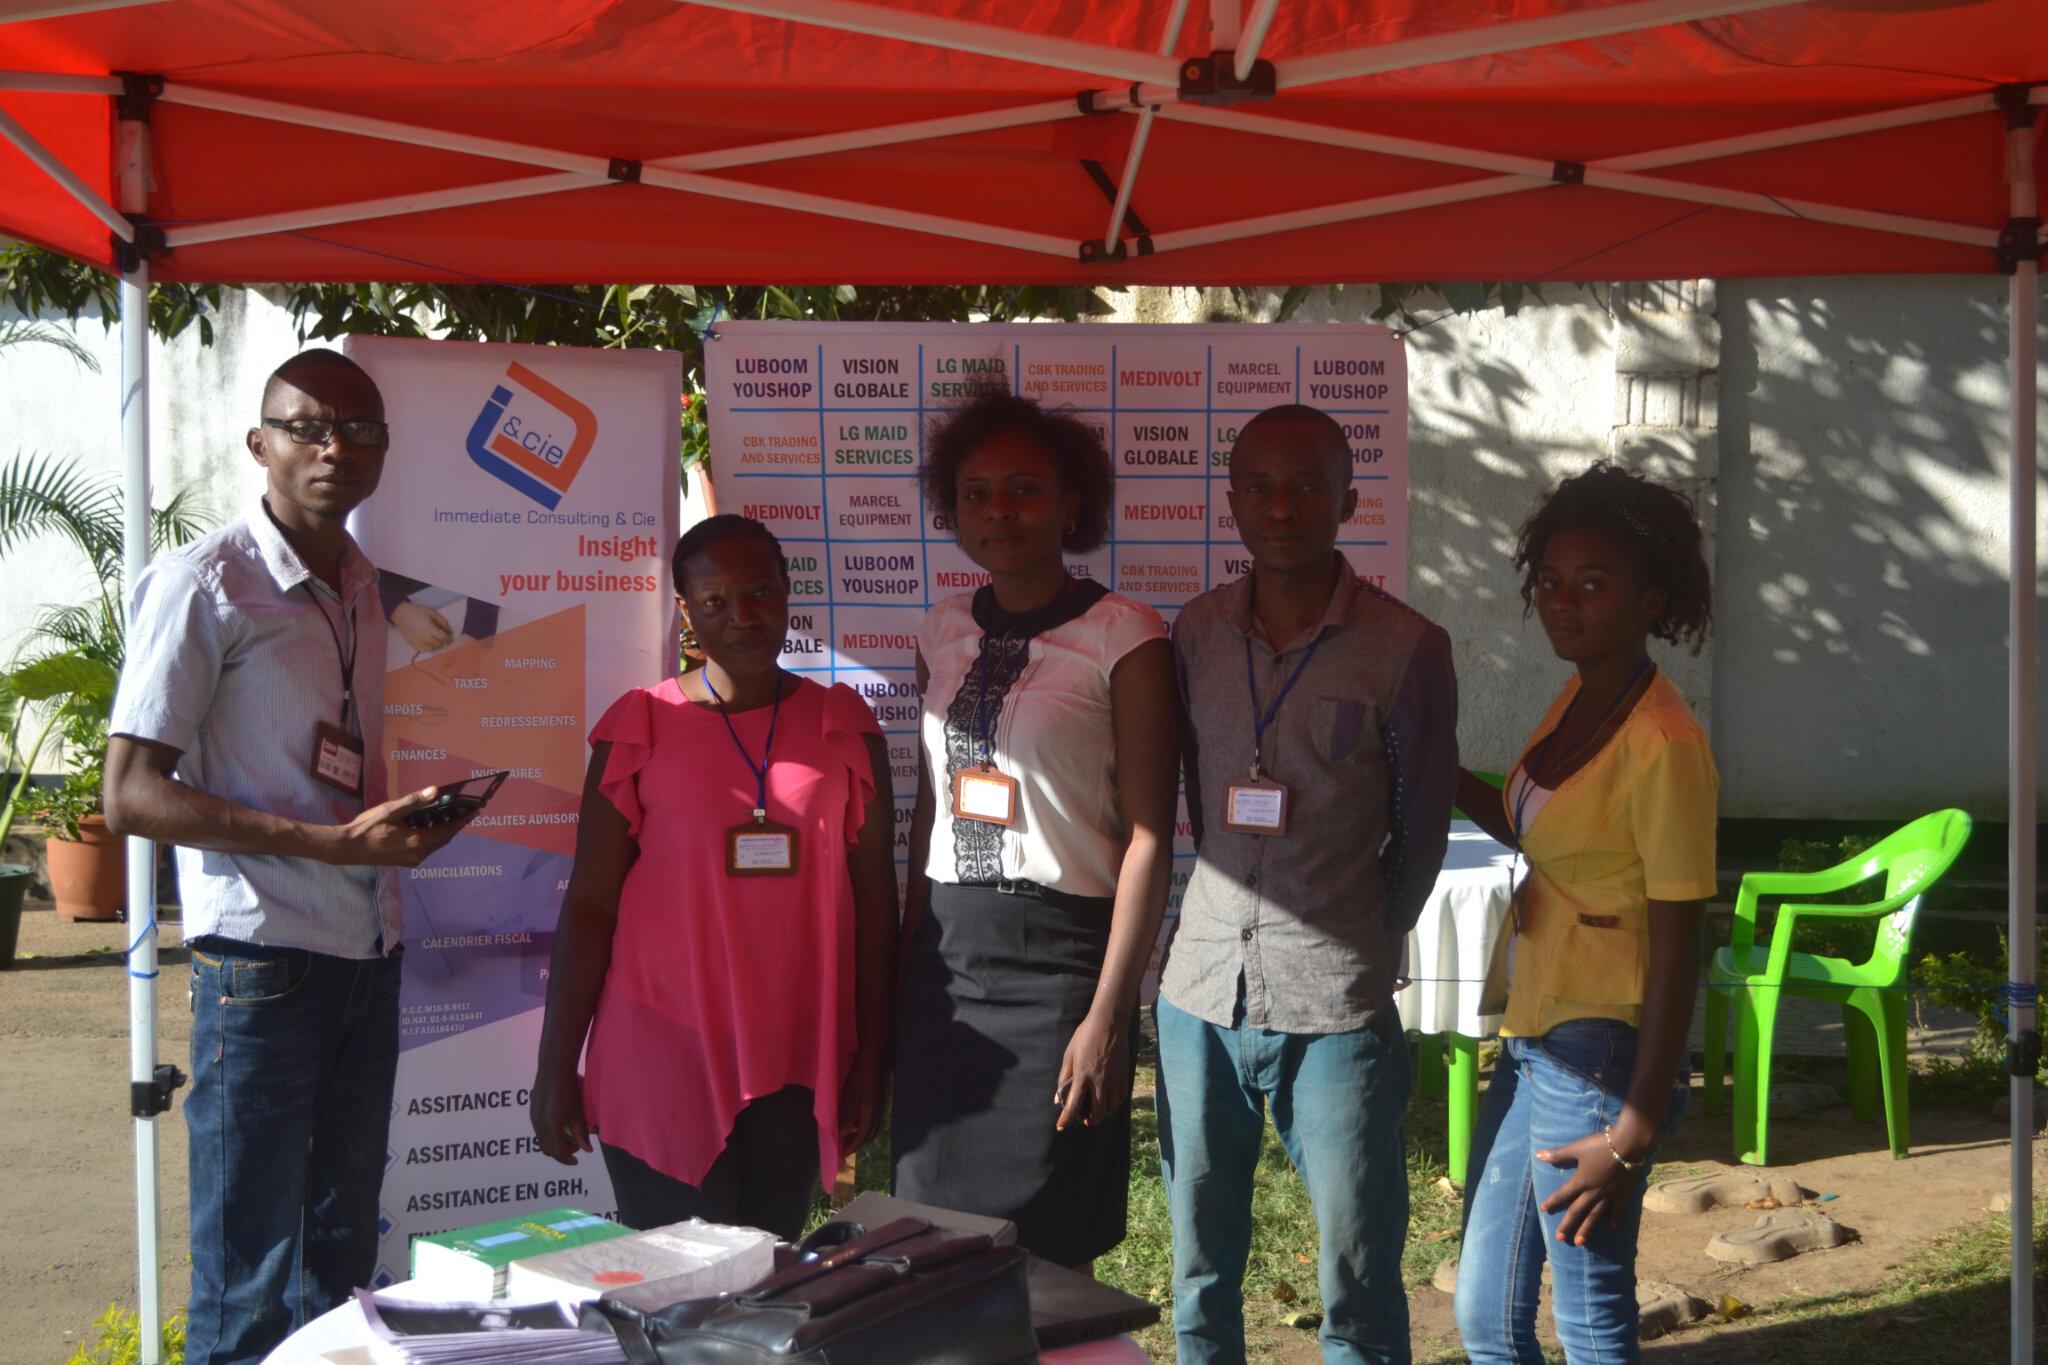 Equipe Immediate Consulting lors d'une expo des jeunes entreprises